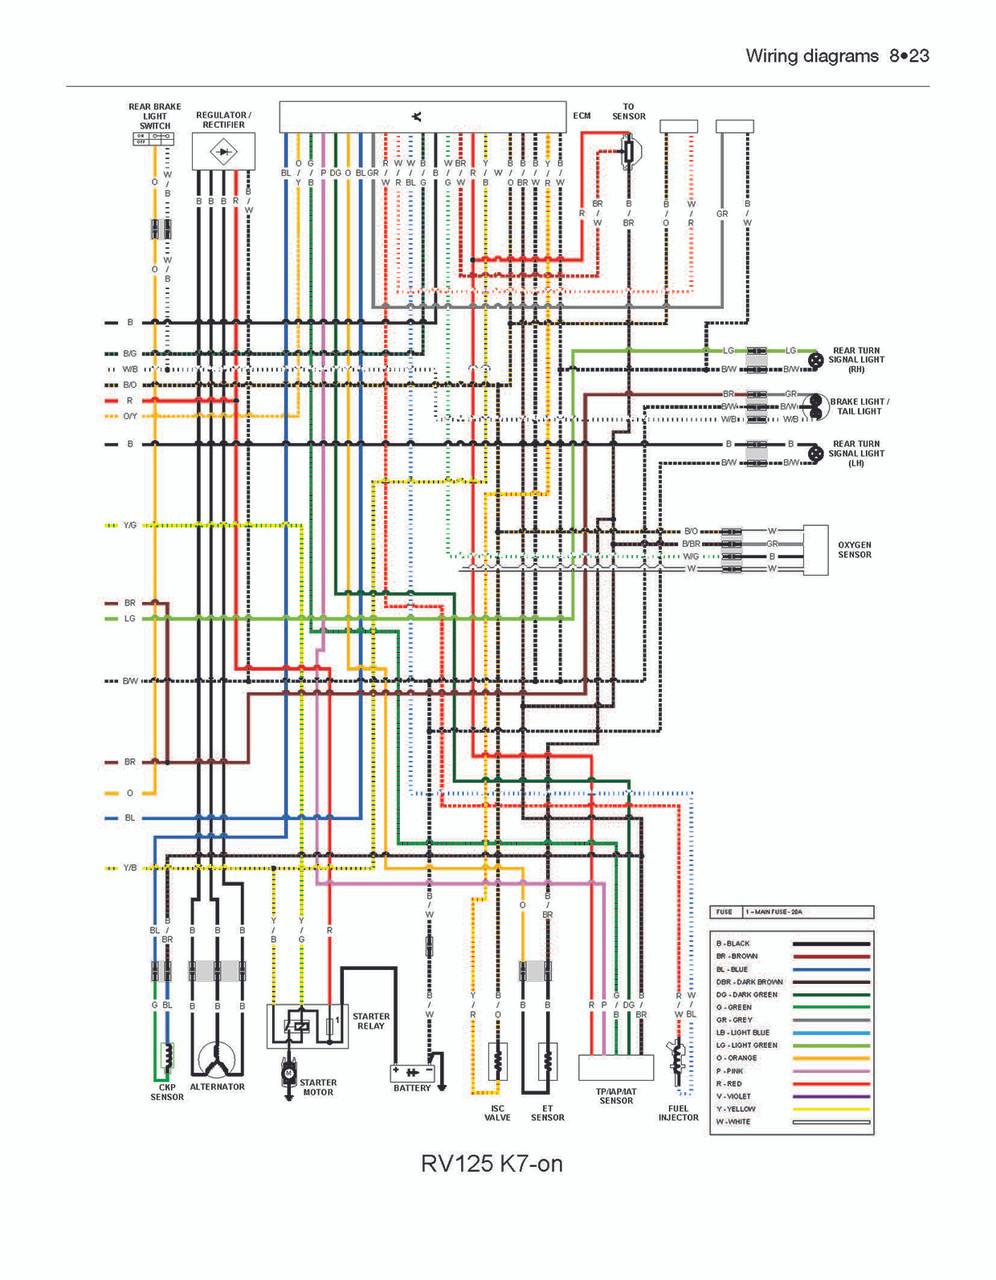 medium resolution of diagram as well vanagon fuse diagram moreover 1981 honda cx500 diagram as well vanagon fuse diagram moreover 1981 honda cx500 wiring